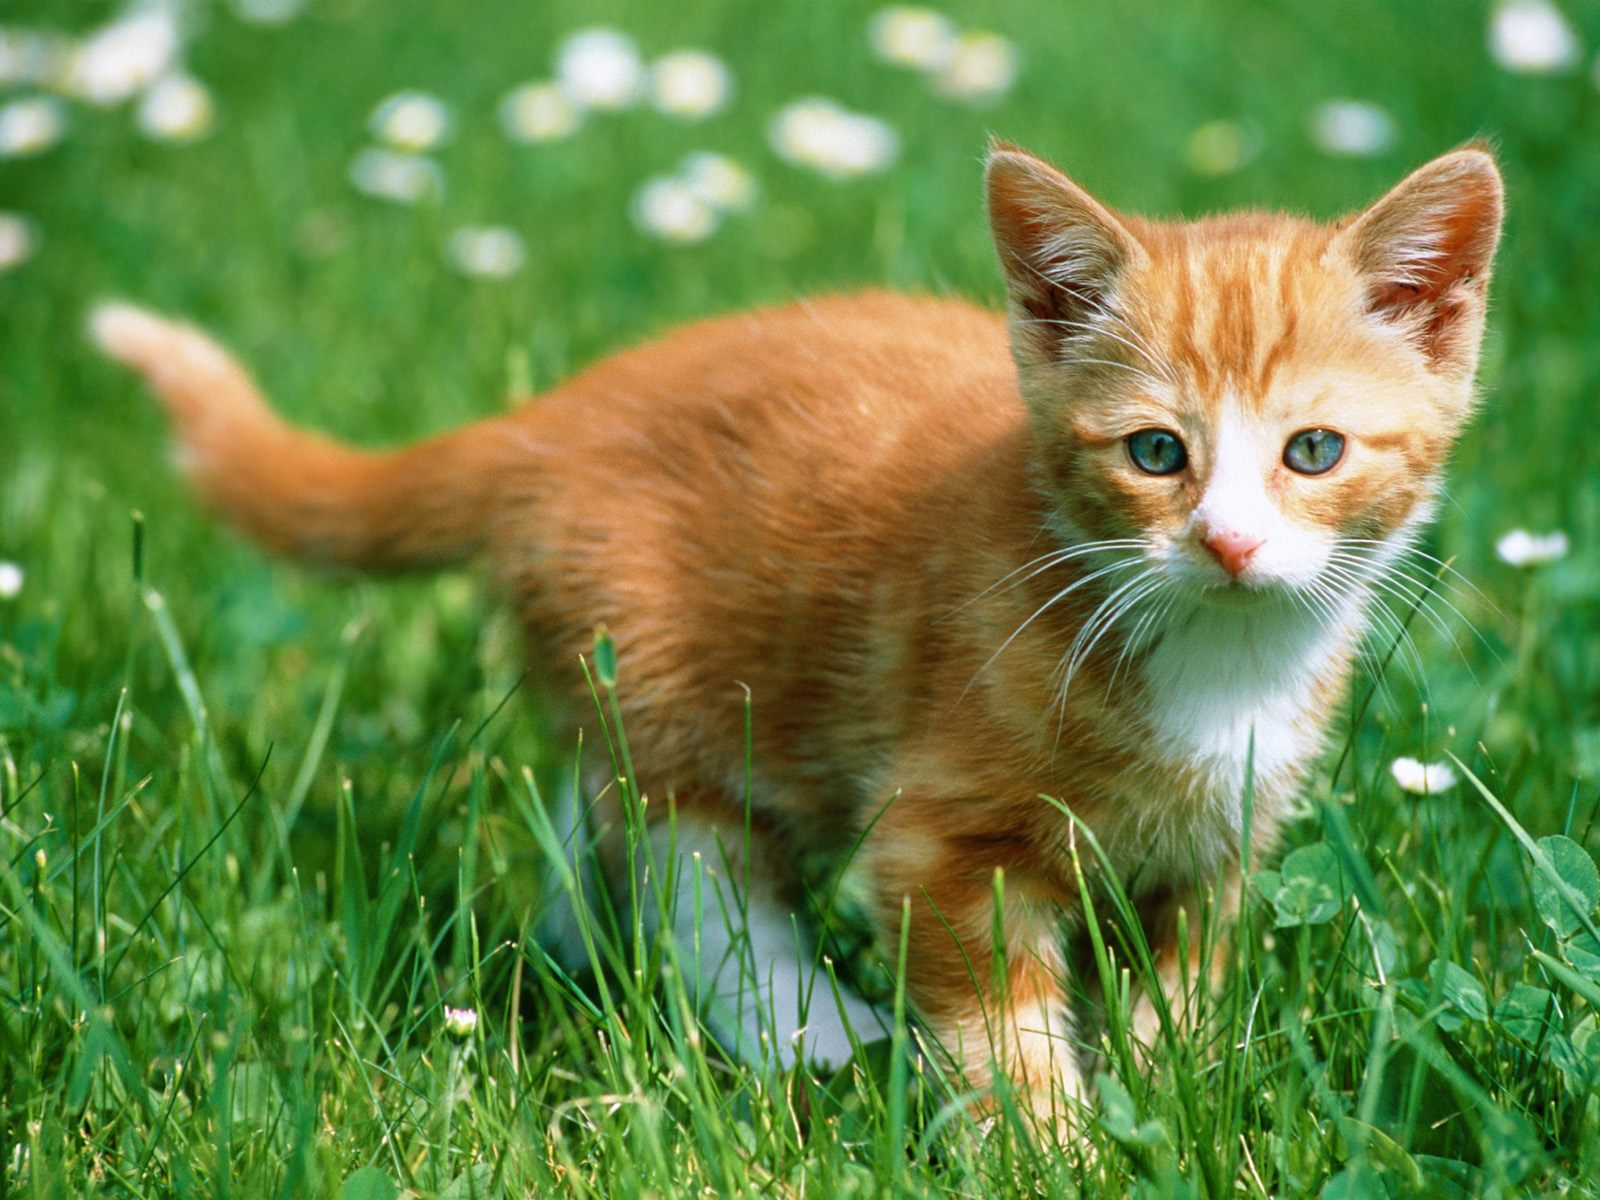 cute kitten wallpaper kittens - photo #3